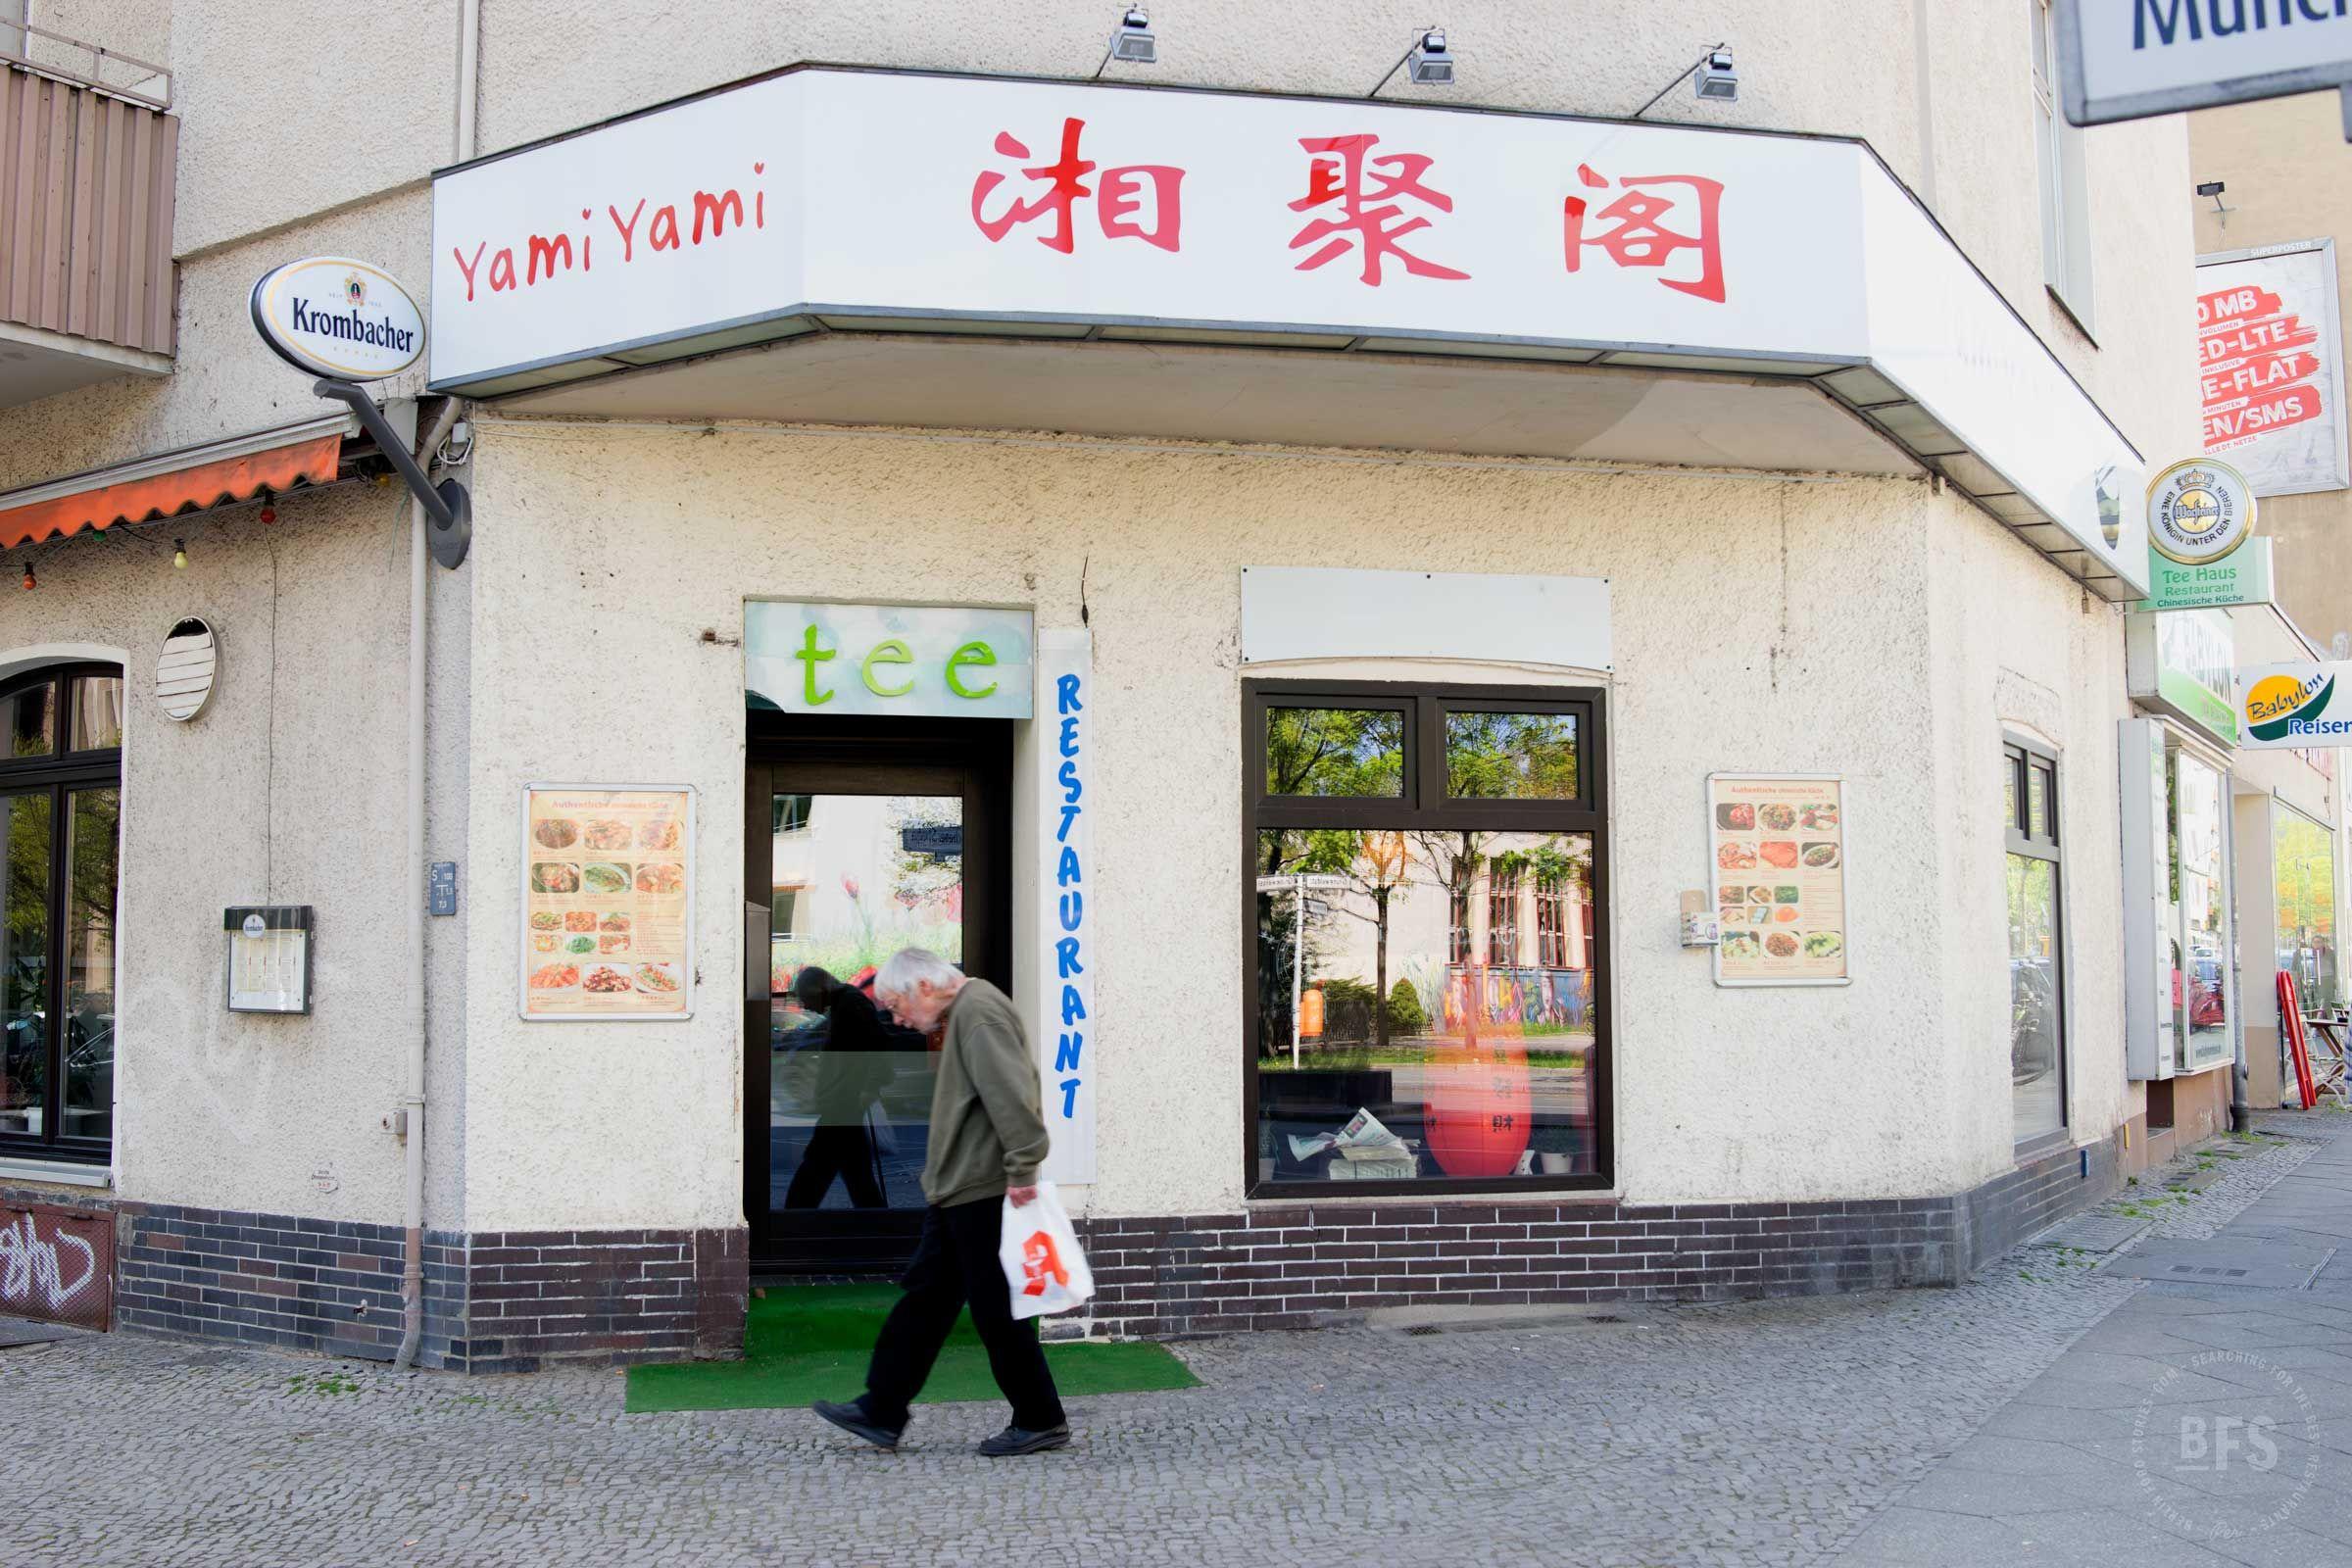 Yami Yami Berlin Food Stories Berlin Food Chinese Restaurant Yami Yami